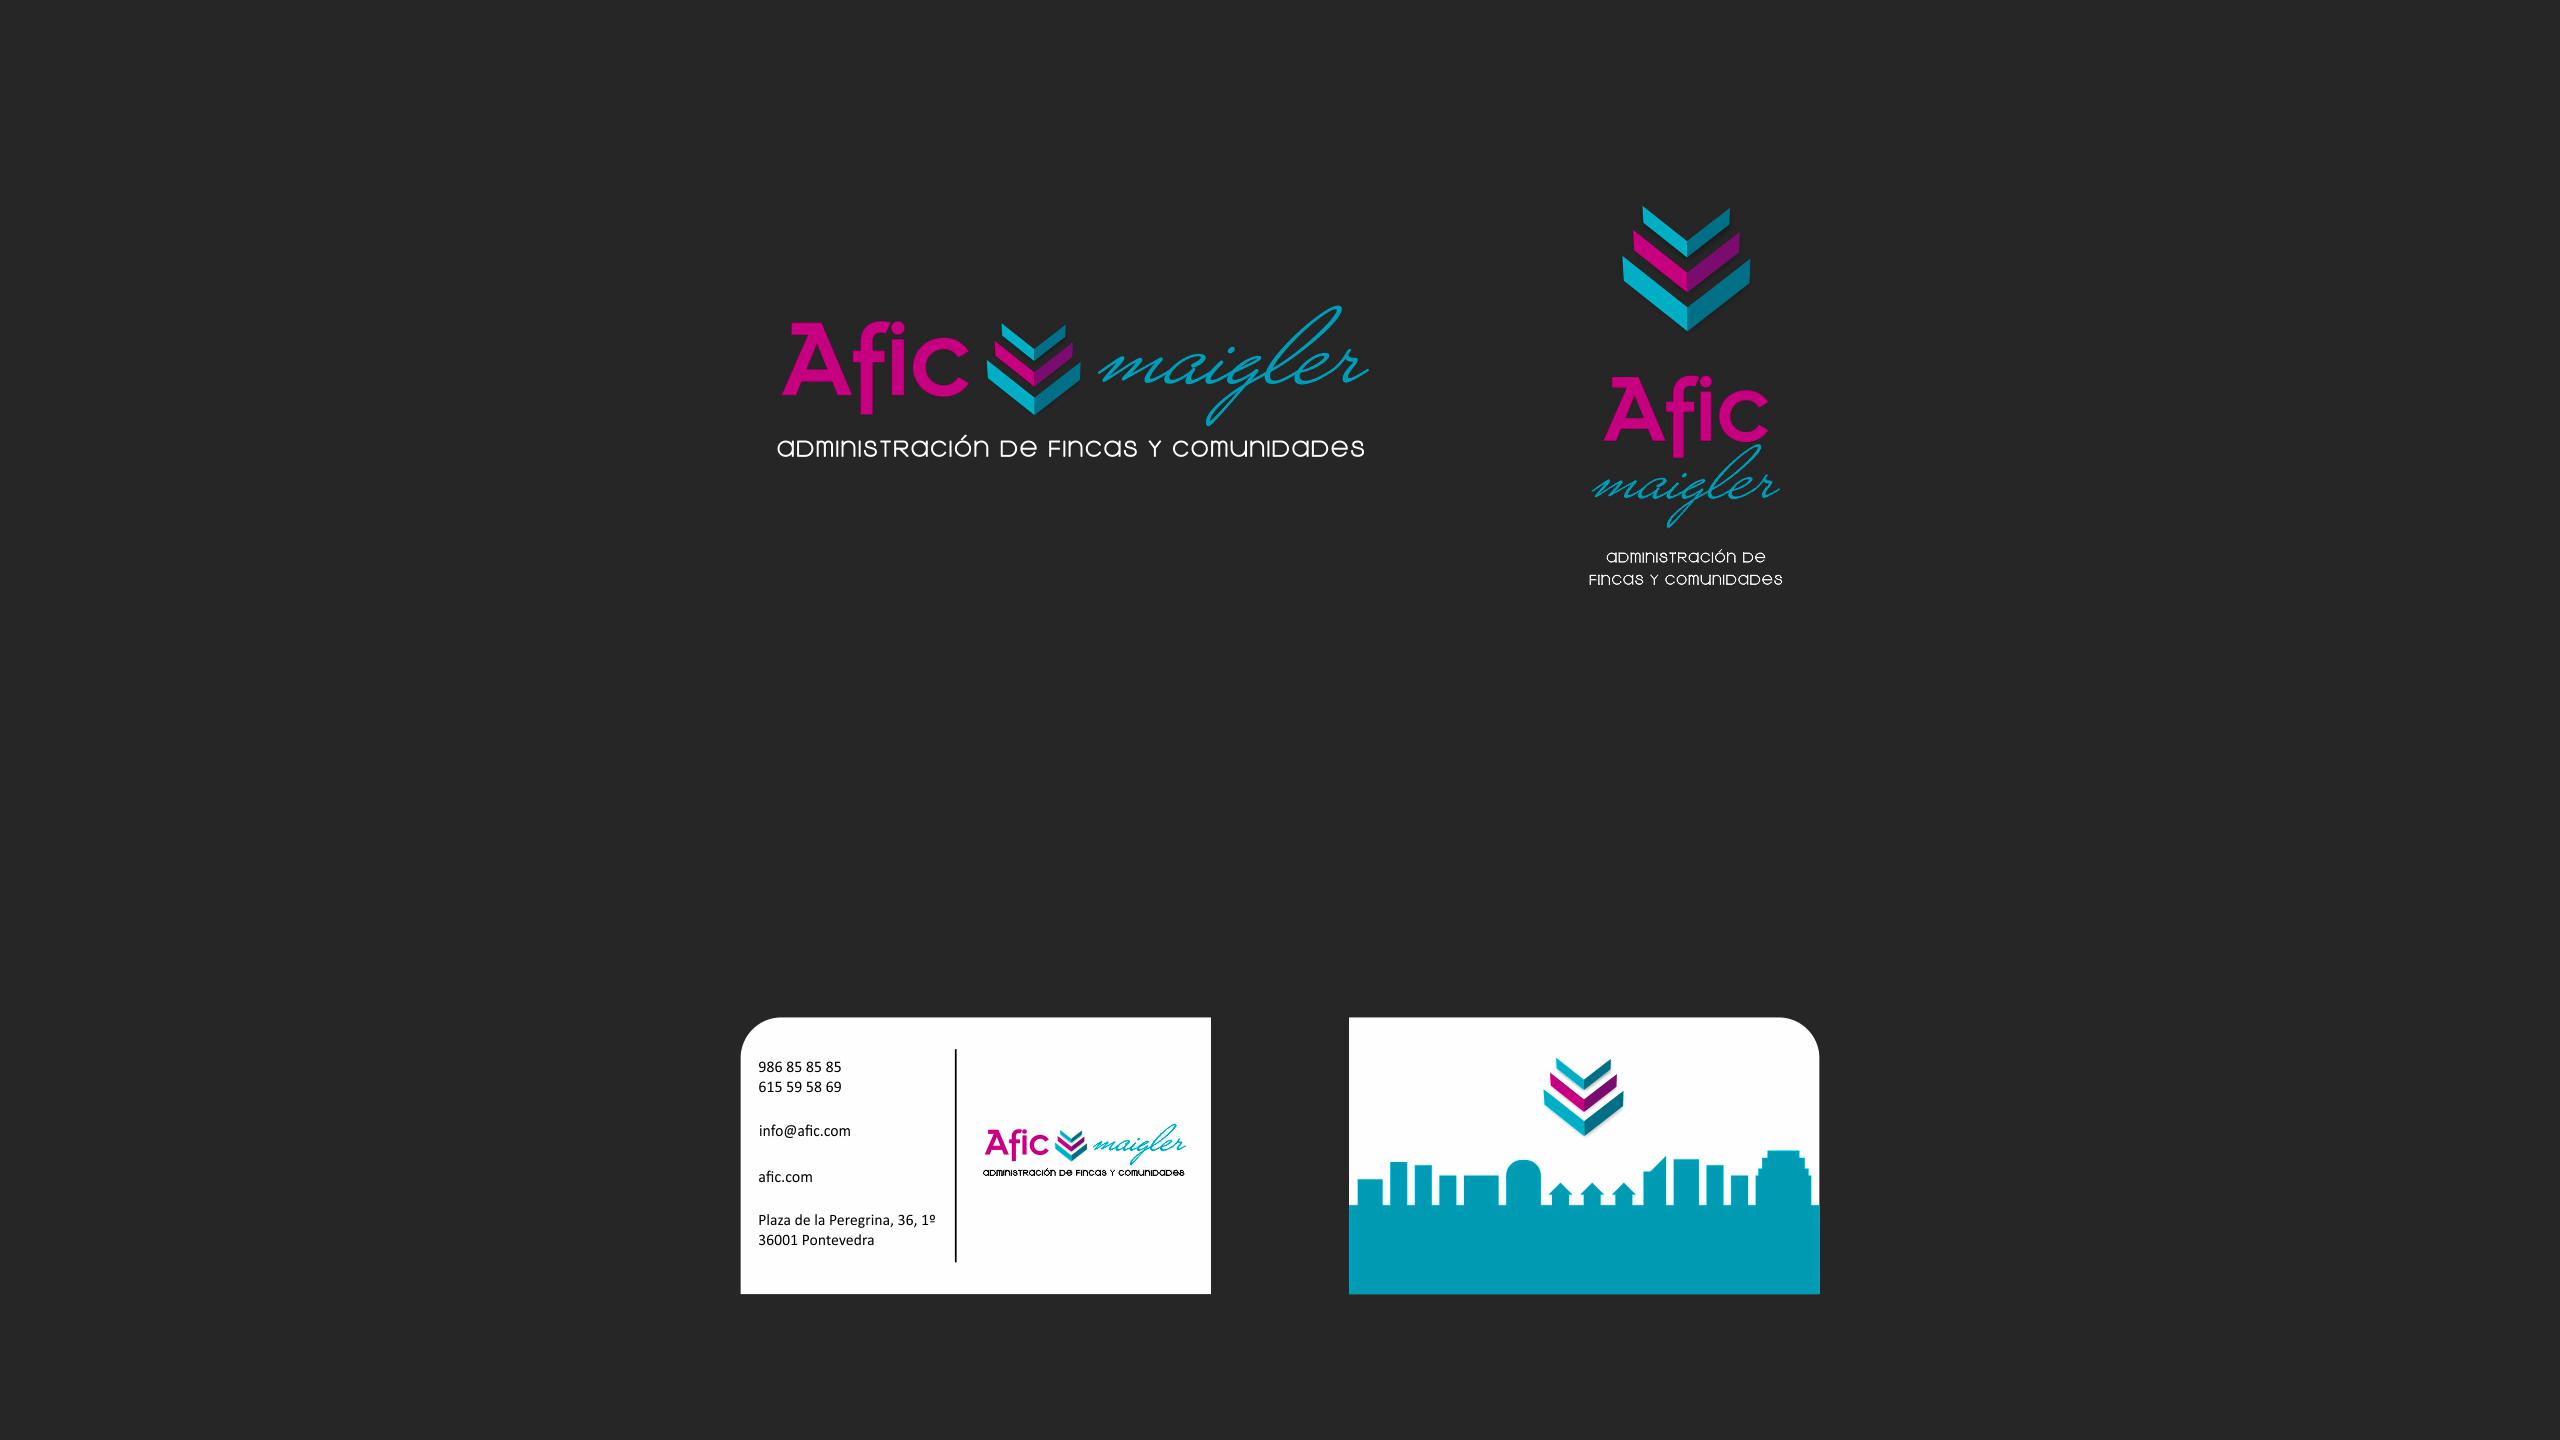 Diseño Afic Maigler logotipo y tarjeta